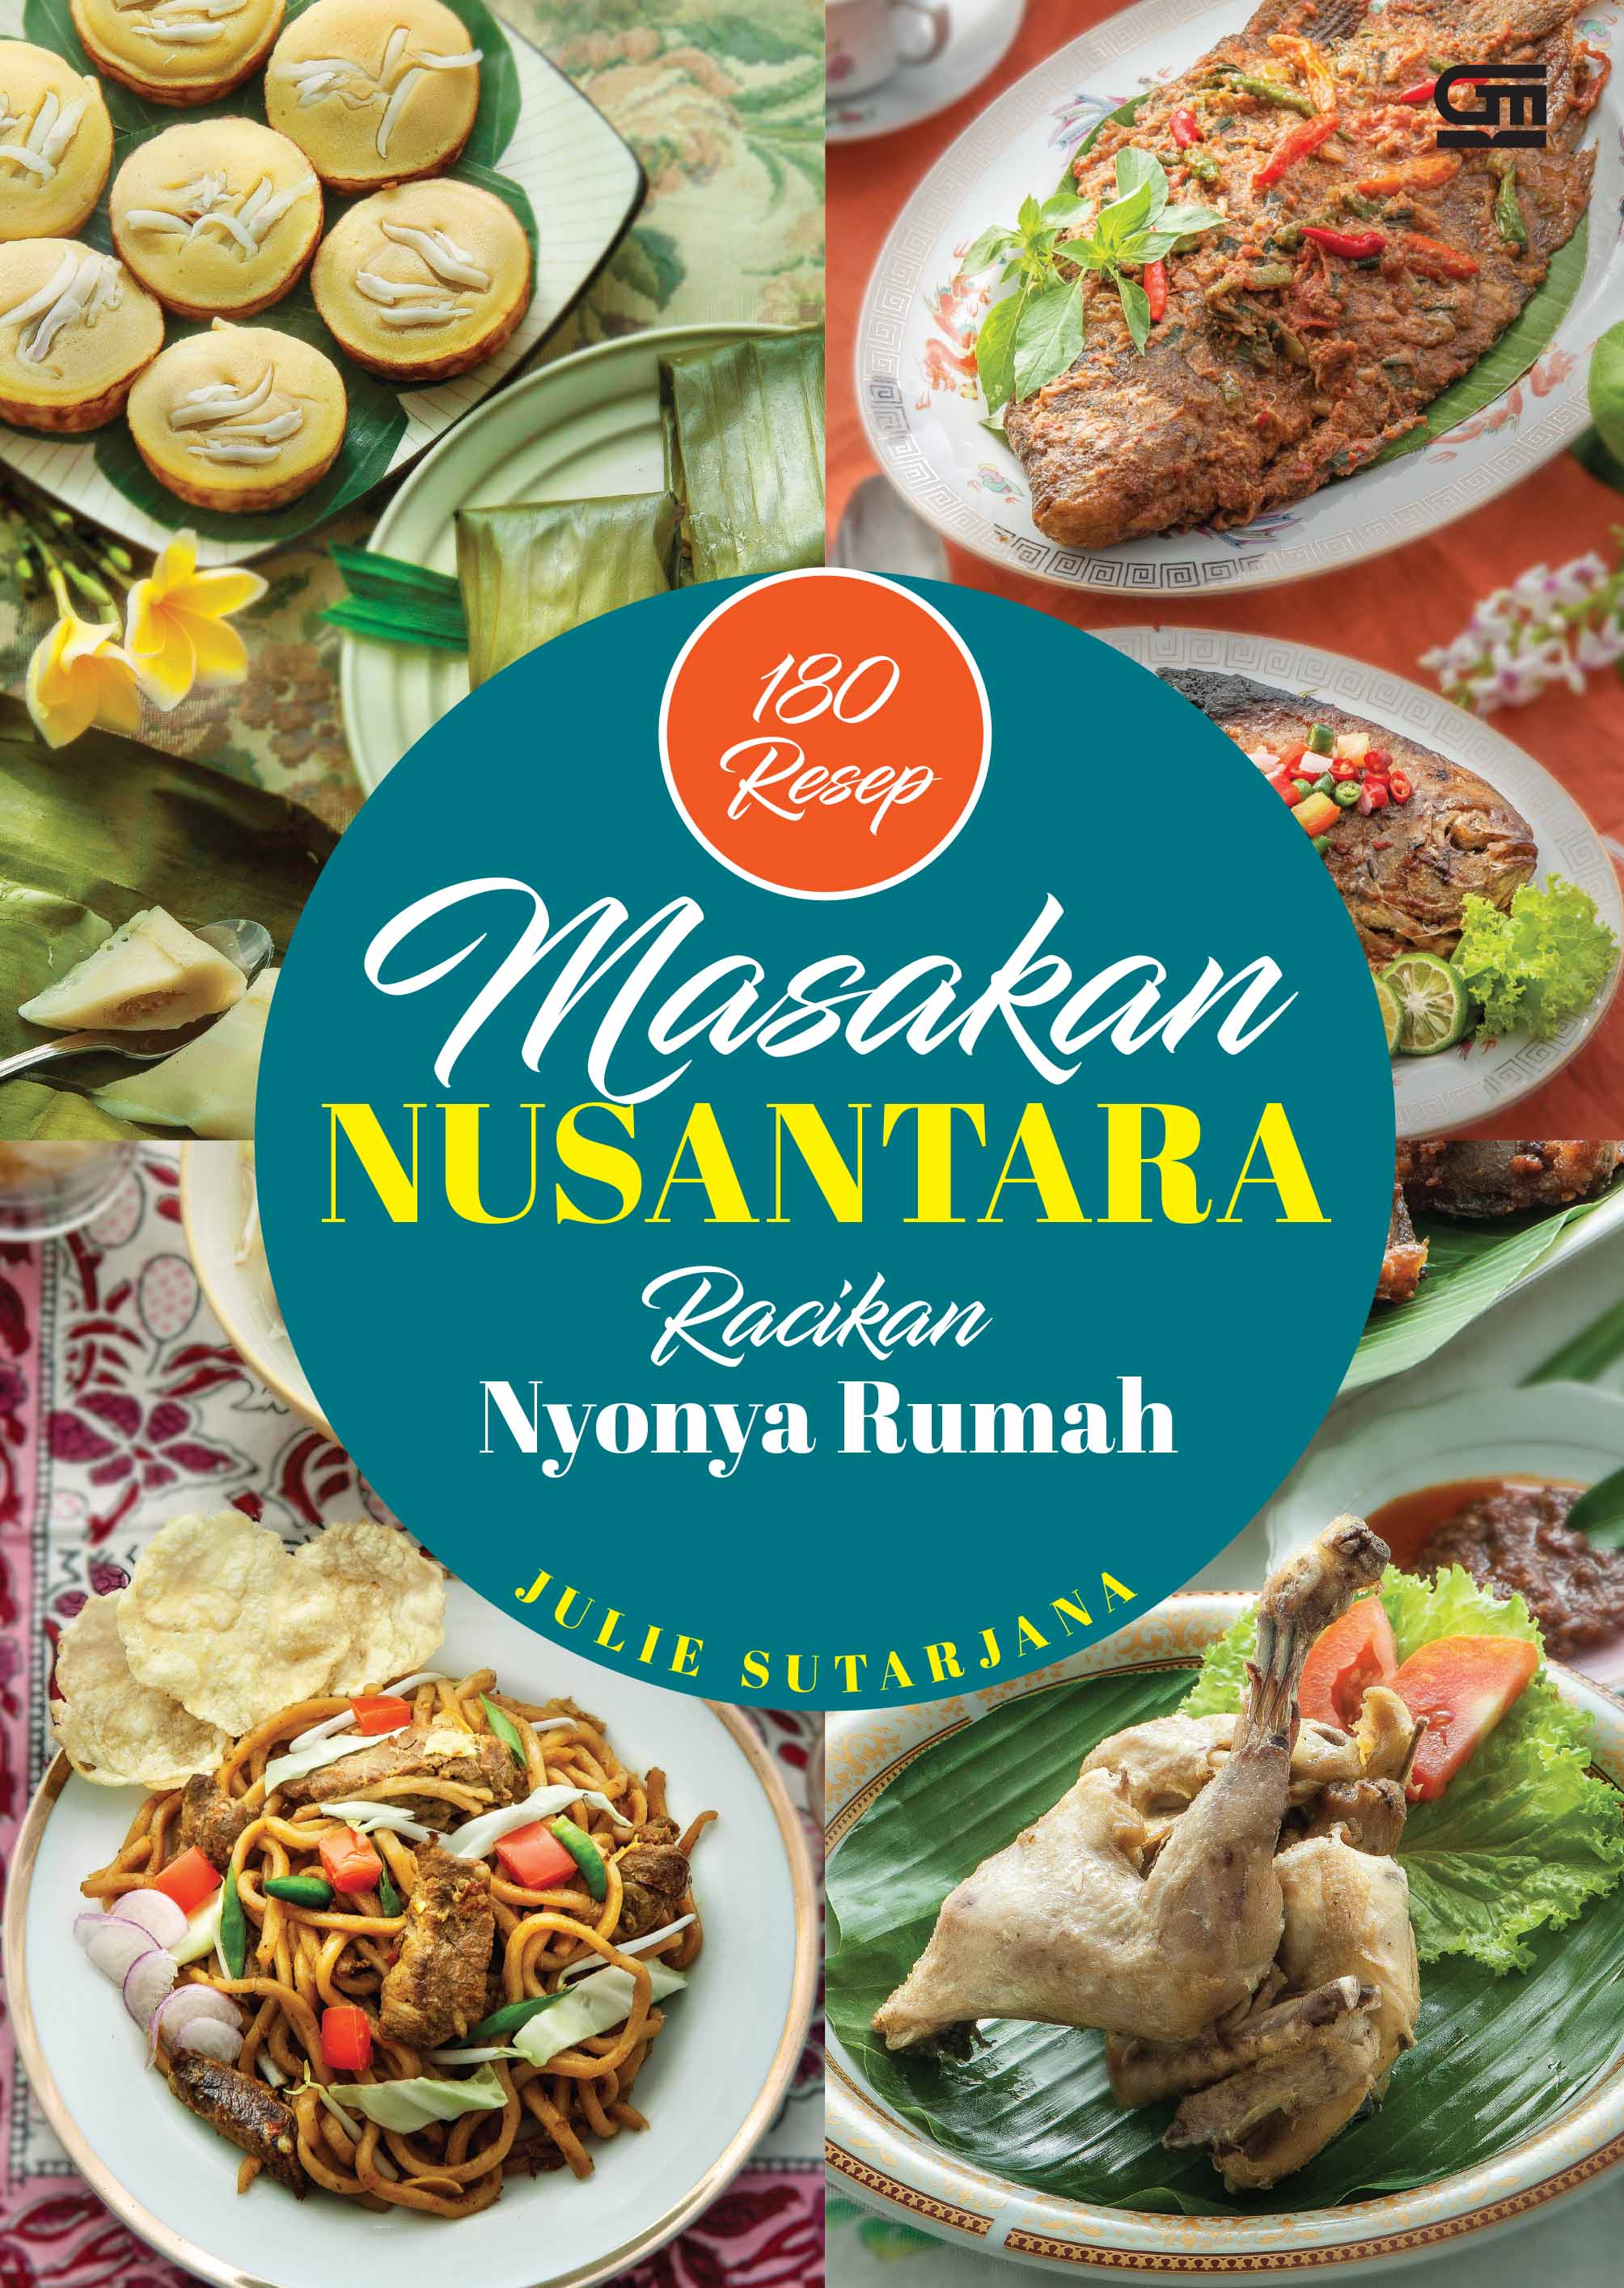 180 Resep Masakan Nusantara Racikan Nyonya Rumah